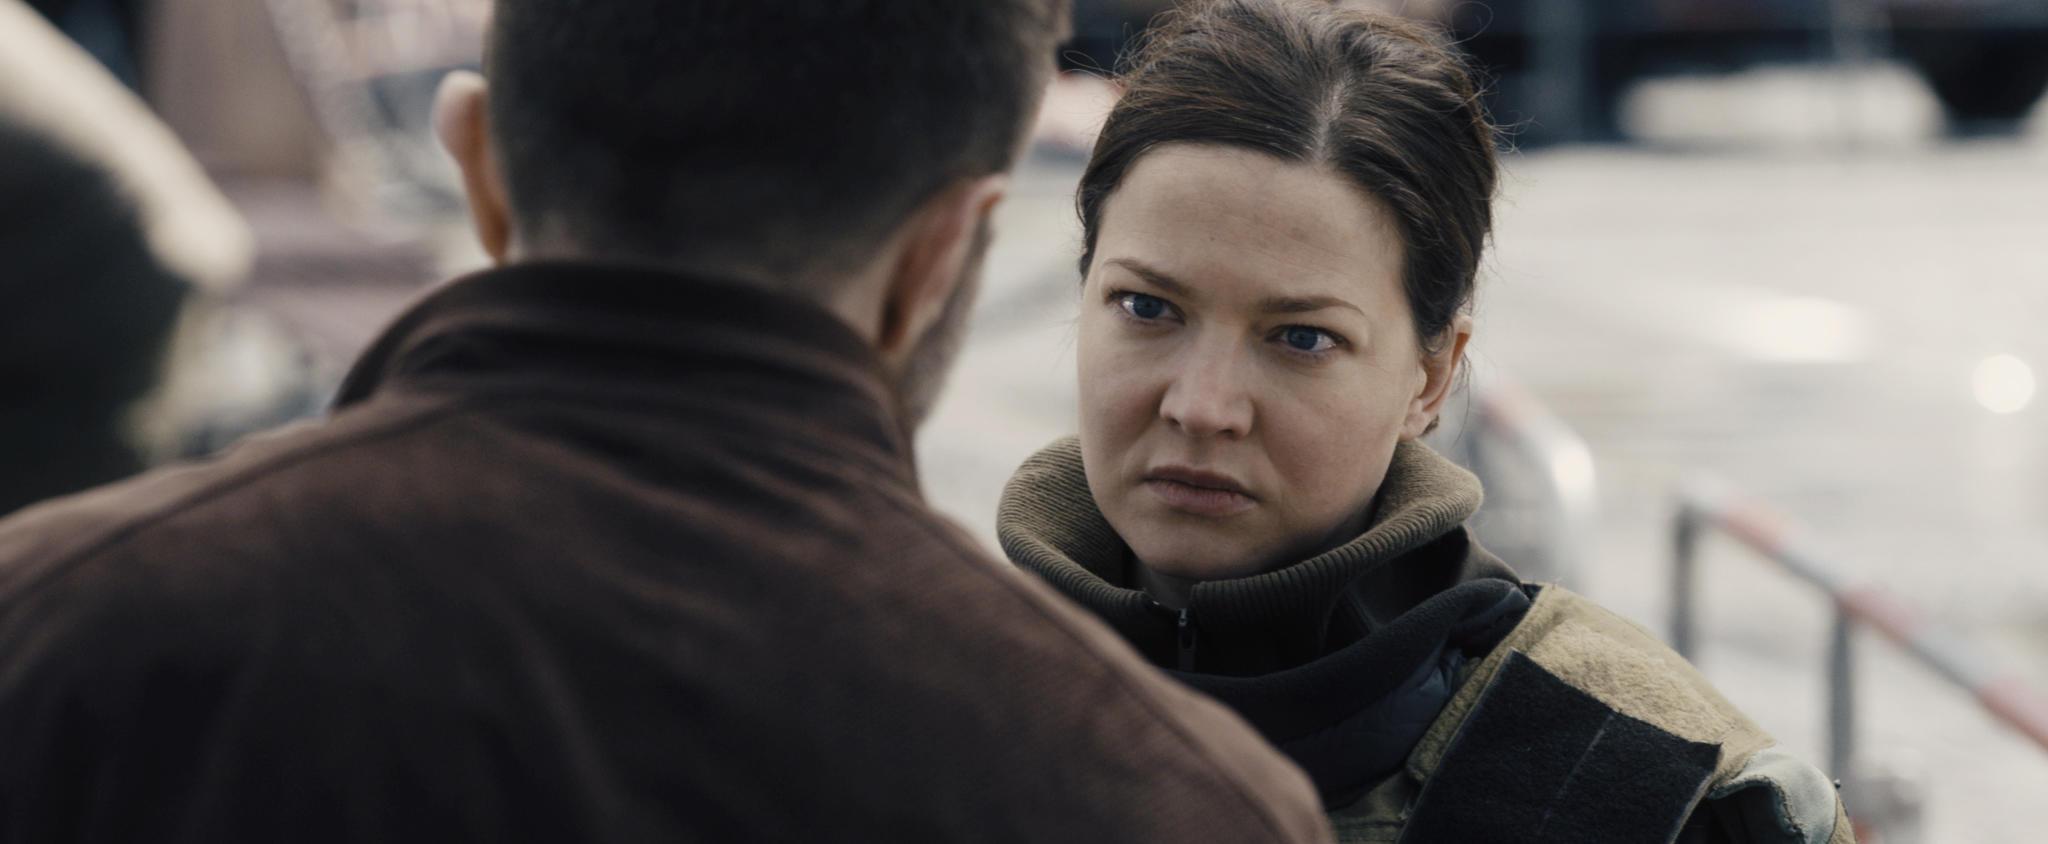 Hannah Herzsprung in the film.